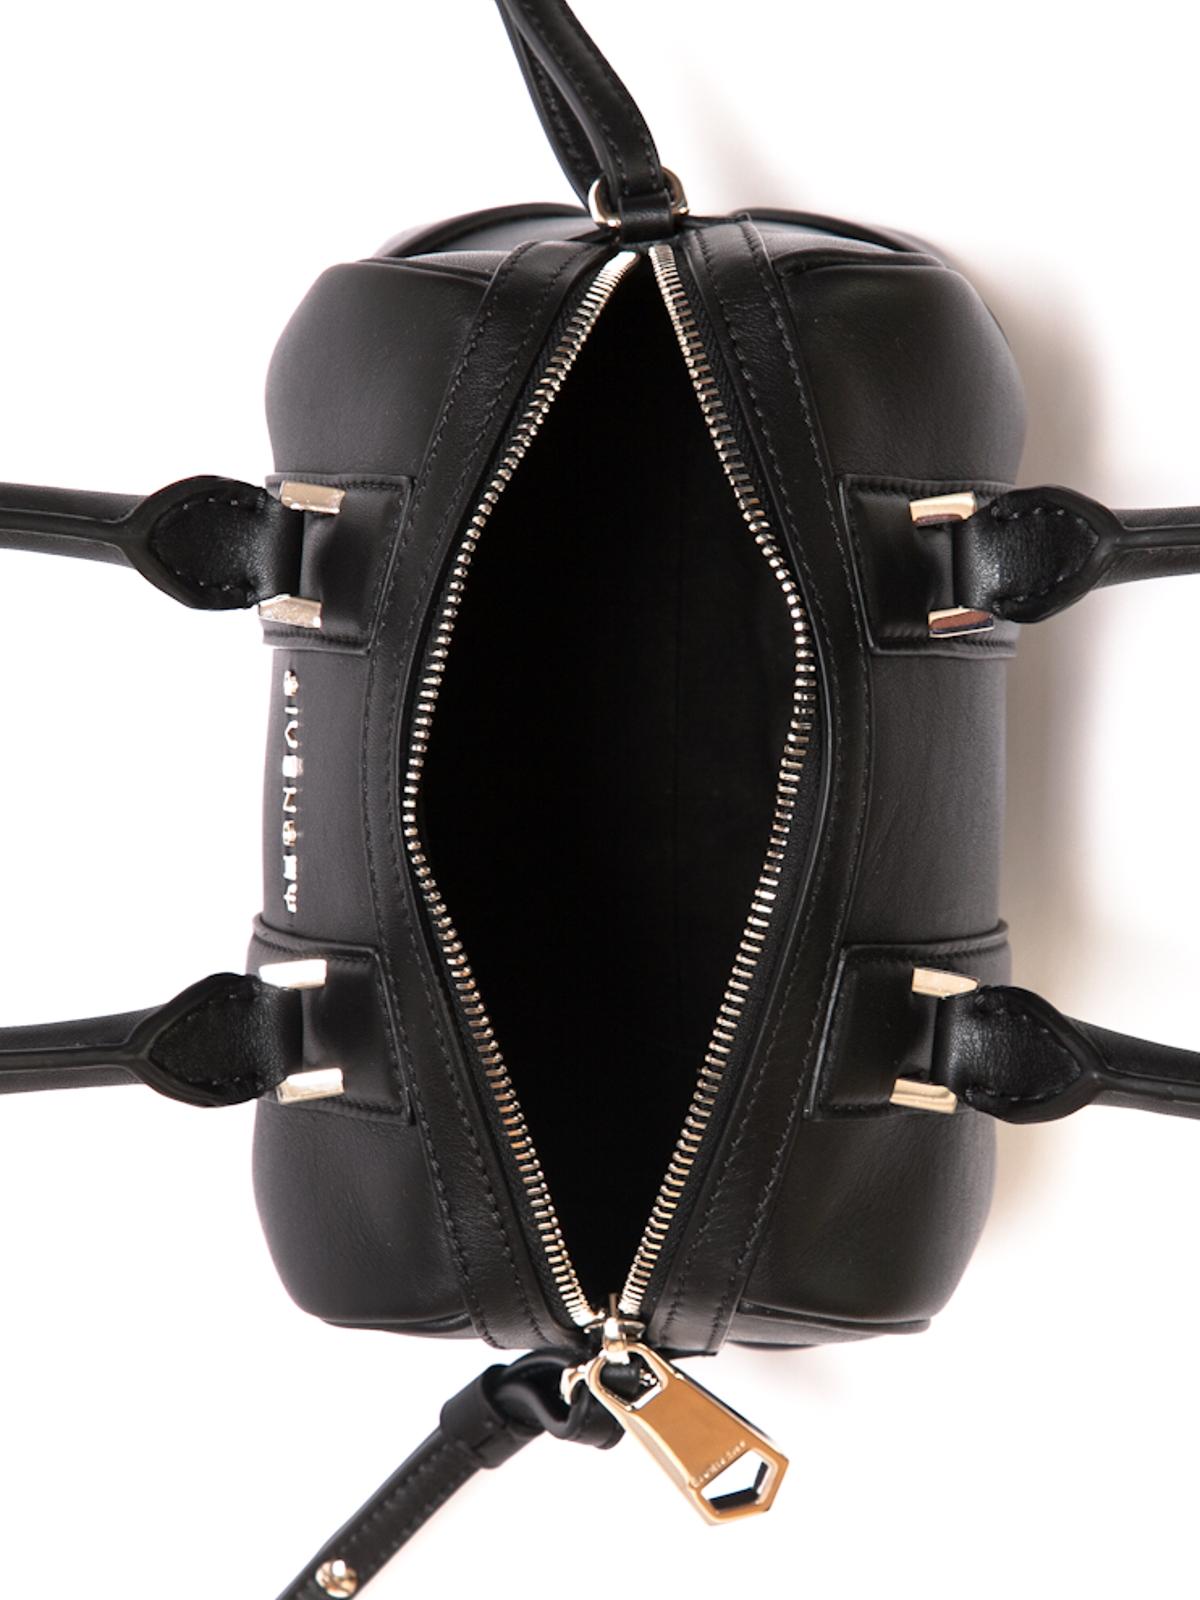 57342b6cad3a ... Micro Lucrezia-satchel shop online GIVENCHY · GIVENCHY bowling bags ...  cheaper c8956 . ...